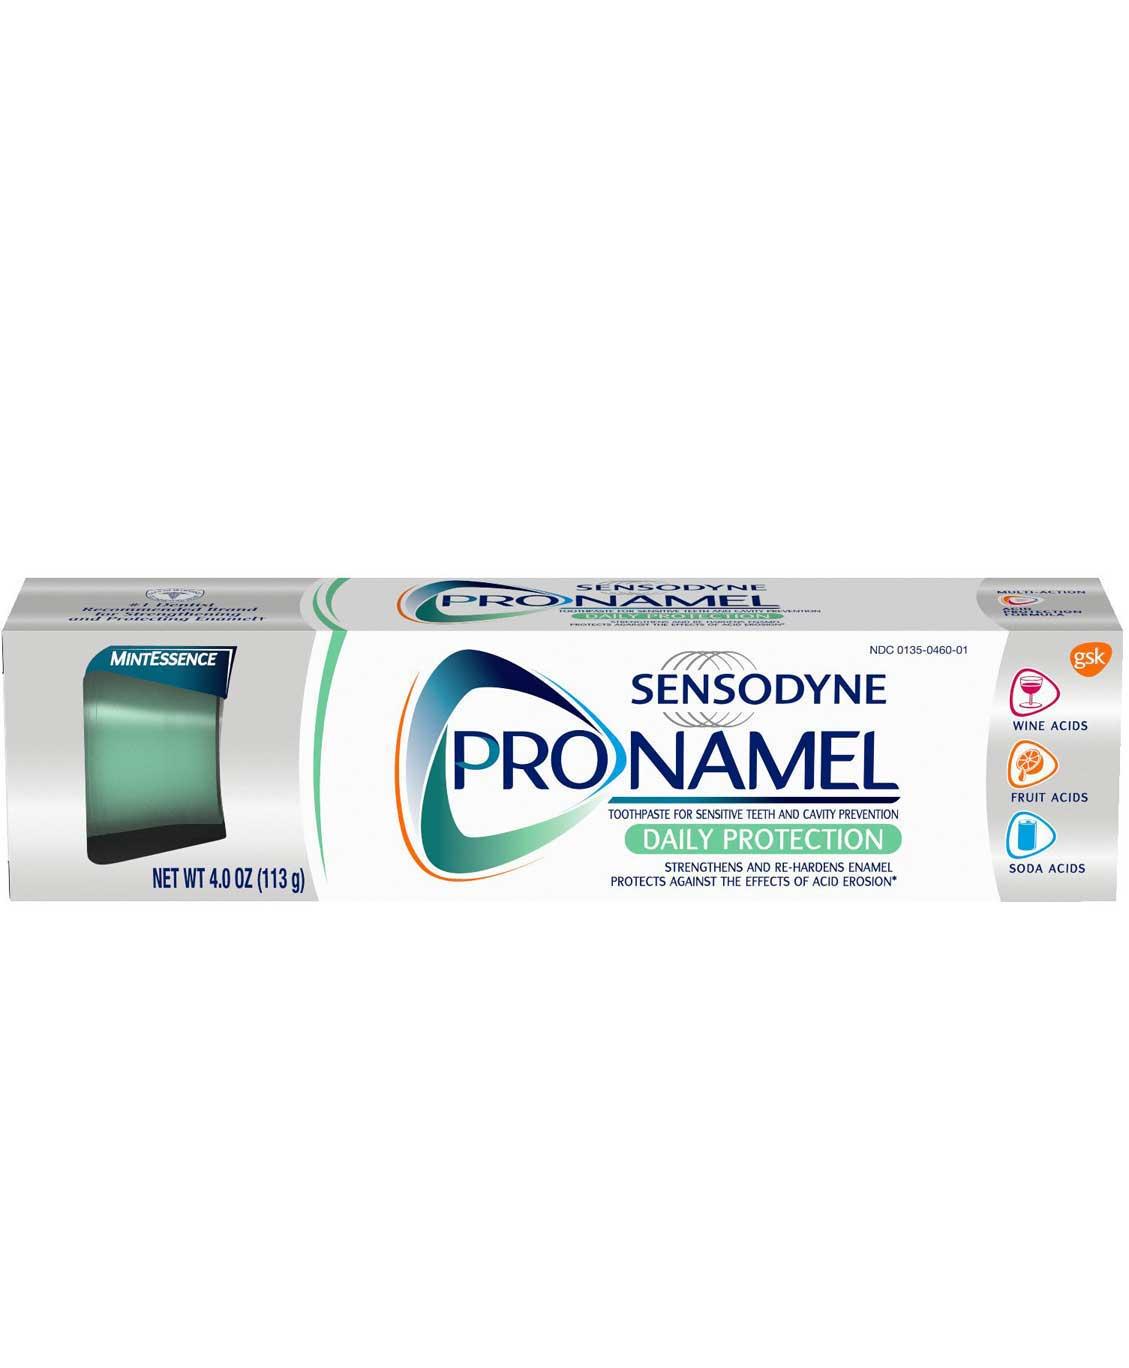 Sensodyne ProNamel Mint Essence Toothpaste 4 oz.